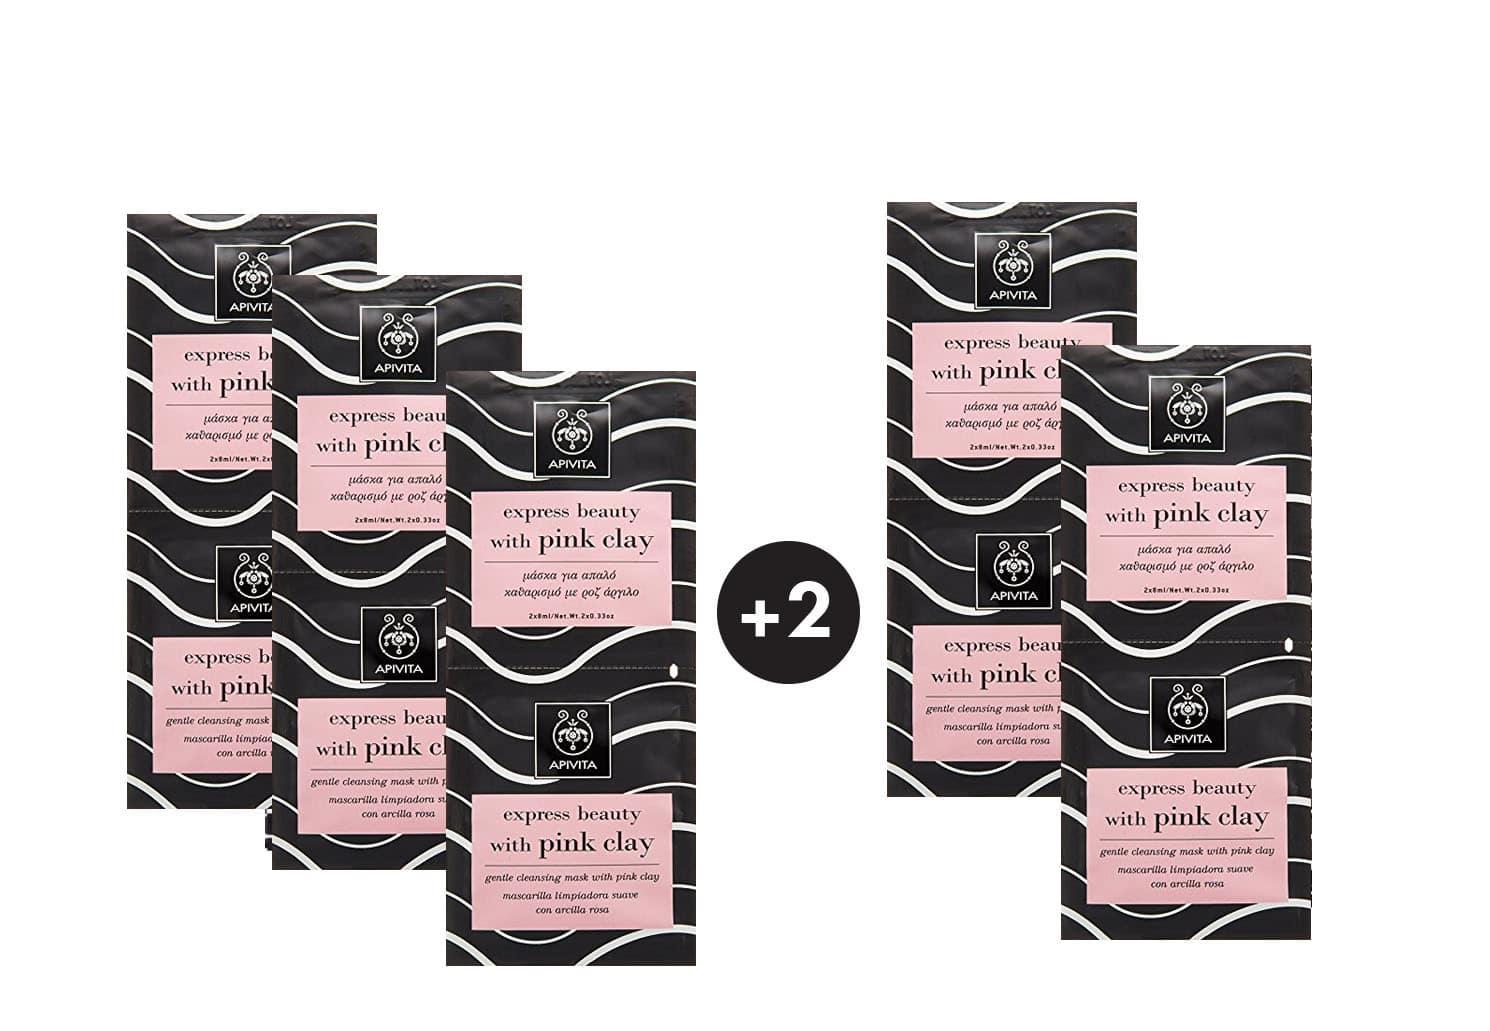 5 x Apivita Pink Clay Face Mask Express Beauty Μάσκα για Απαλό Καθαρισμό του προσώπου με ροζ άργιλο (3+2 ΔΩΡΟ), 10 x 8ml